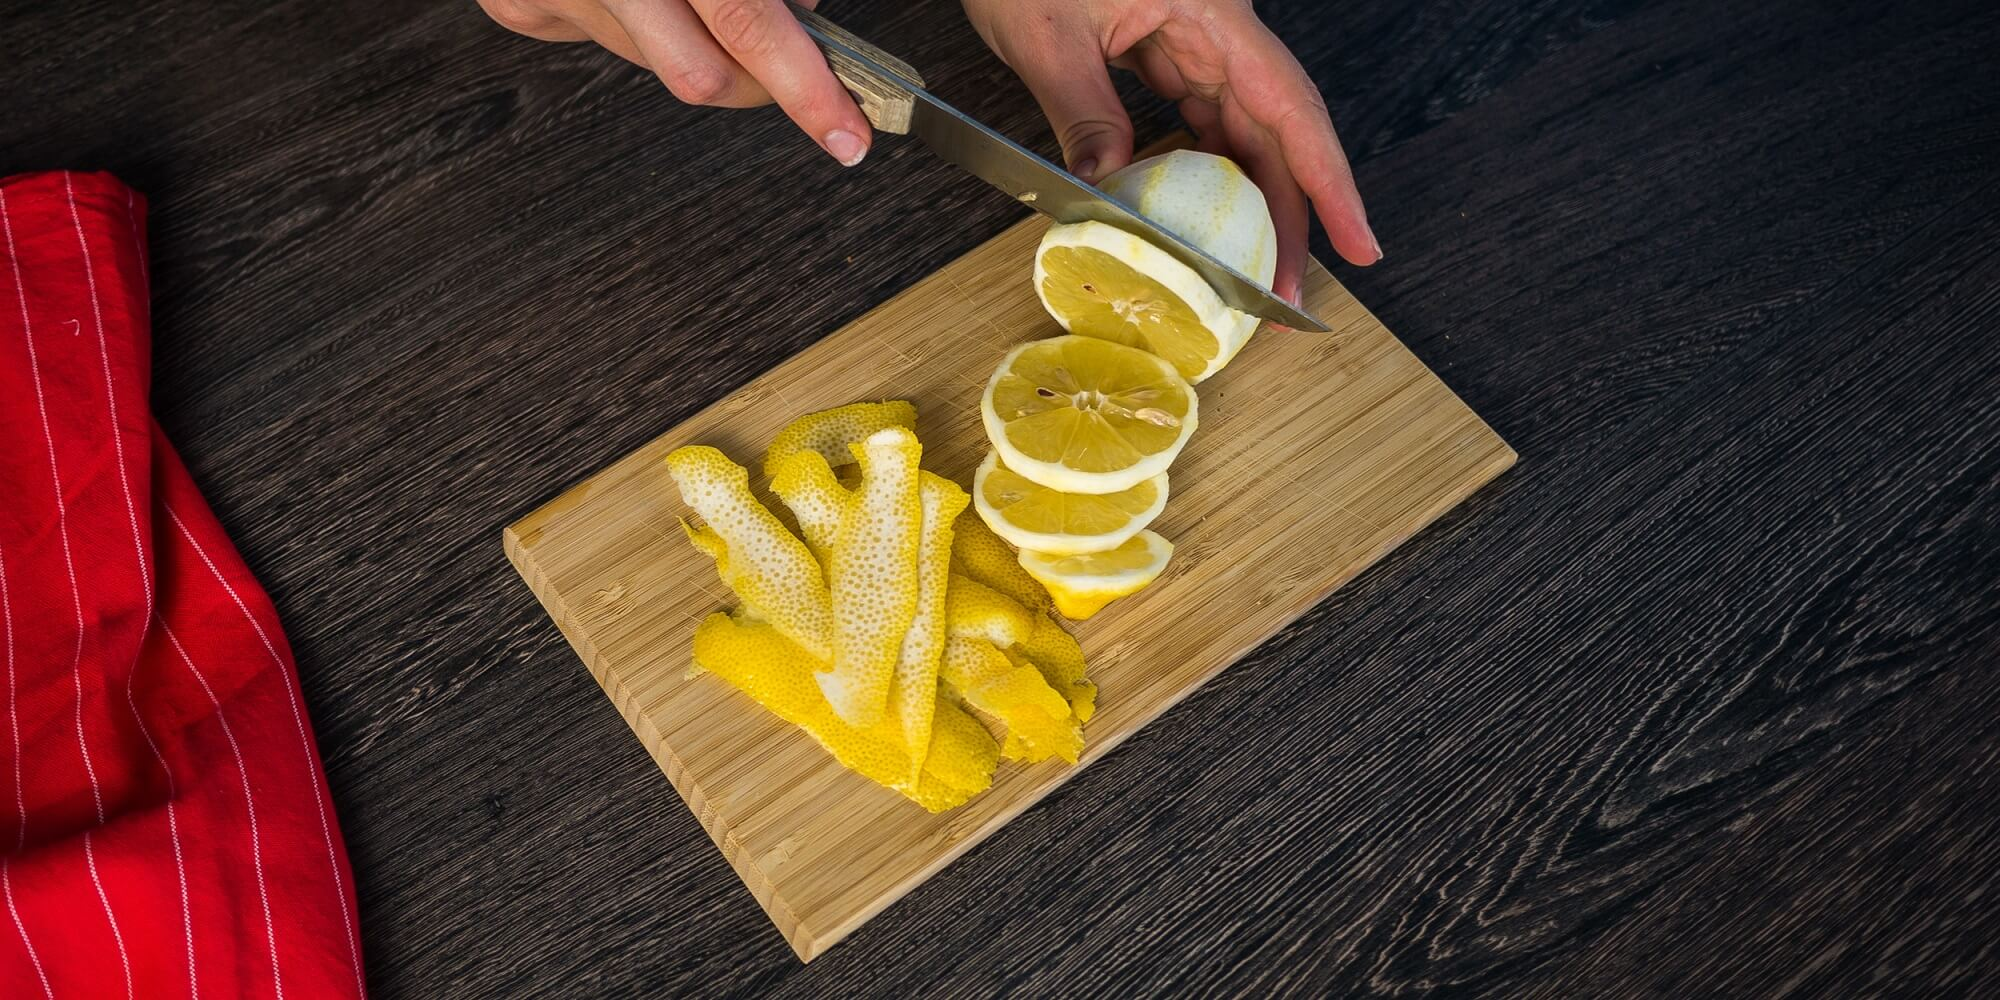 Почистите и нарежьте лимон